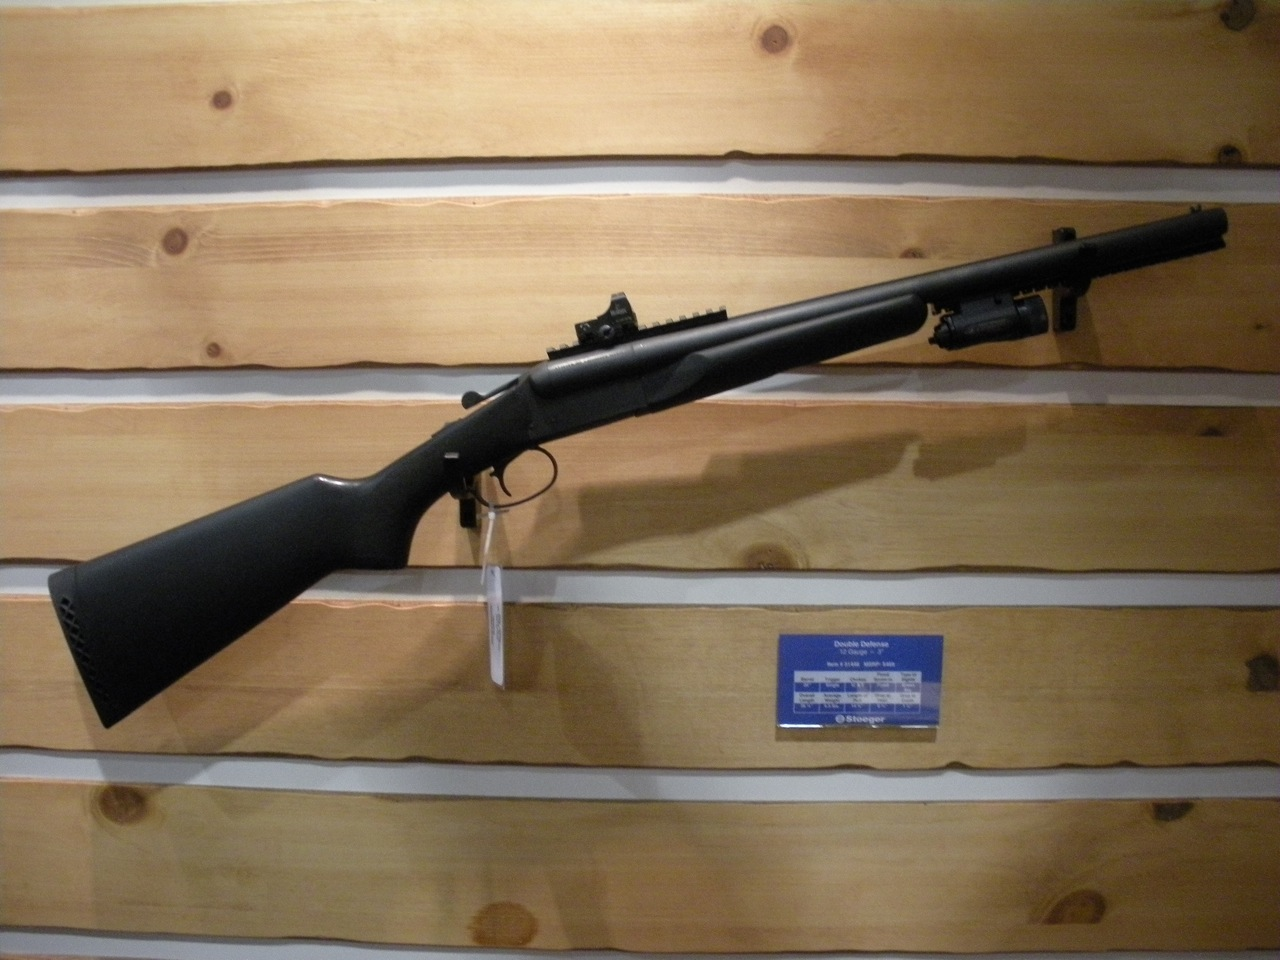 Tactical Double Barrel Shotgun | SnarkyBytes